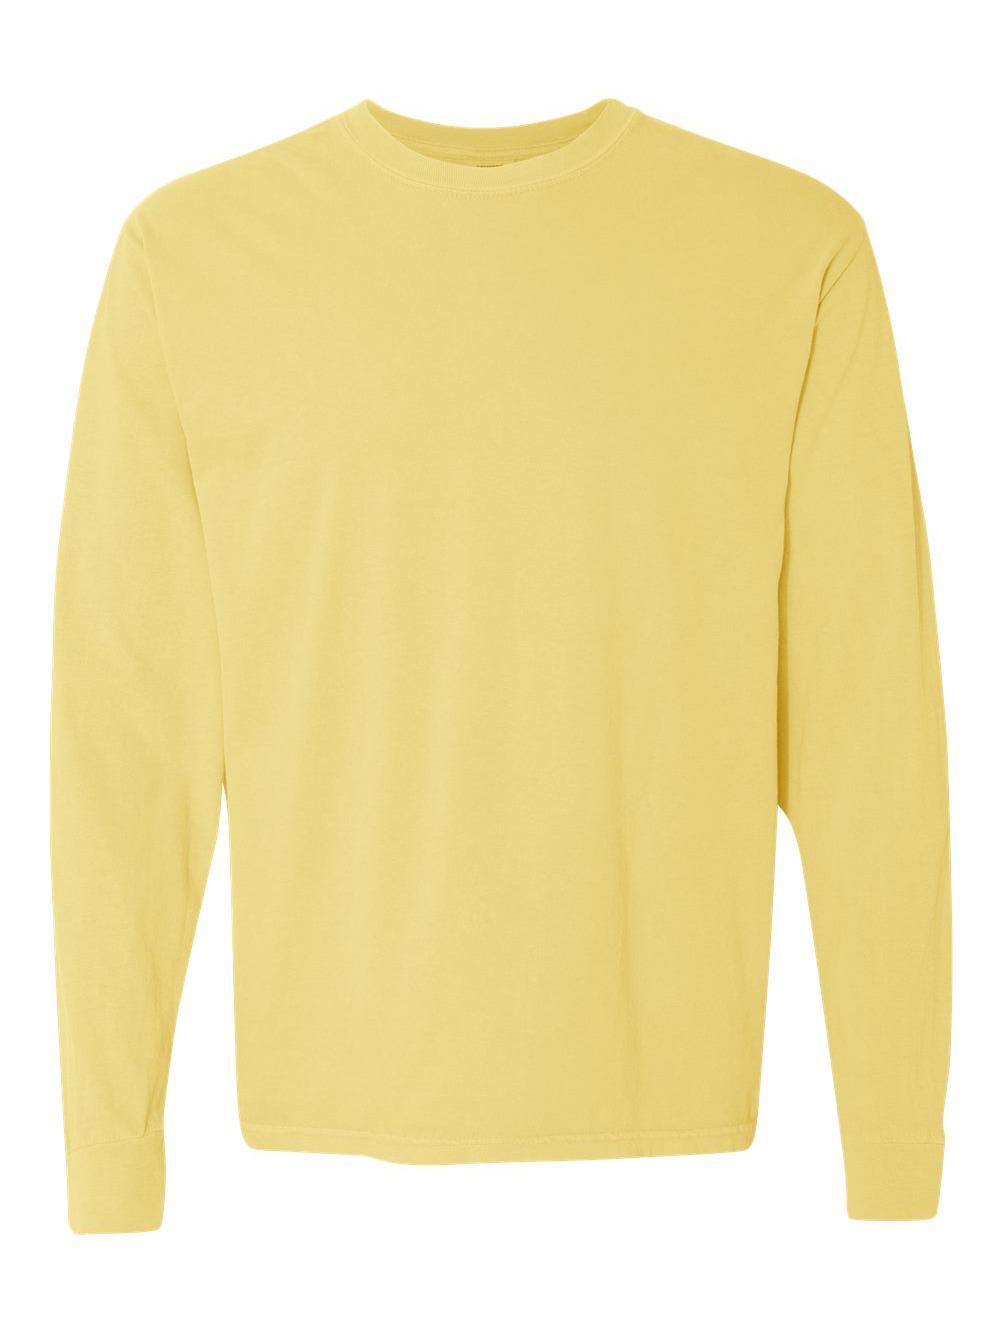 Comfort-Colors-Garment-Dyed-Heavyweight-Ringspun-Long-Sleeve-T-Shirt-6014 thumbnail 21